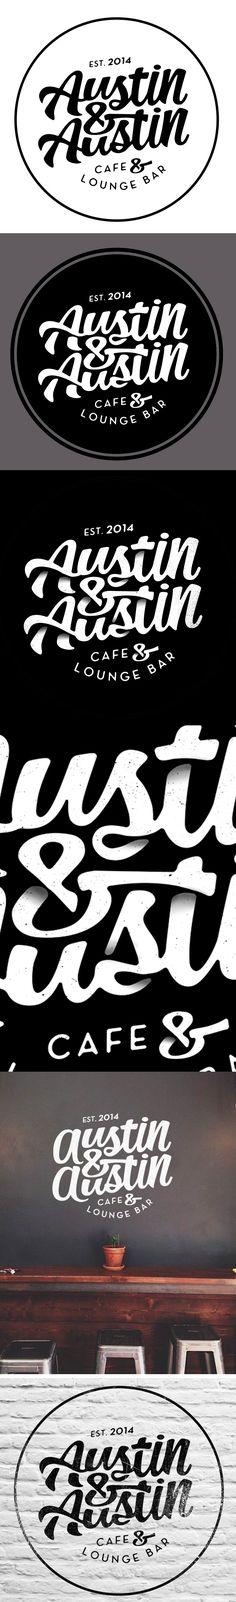 Logotype for Austin & Austin Cafe & Lounge Bar Alex Ramon Mas Design #Logos #Brand #Restaurant